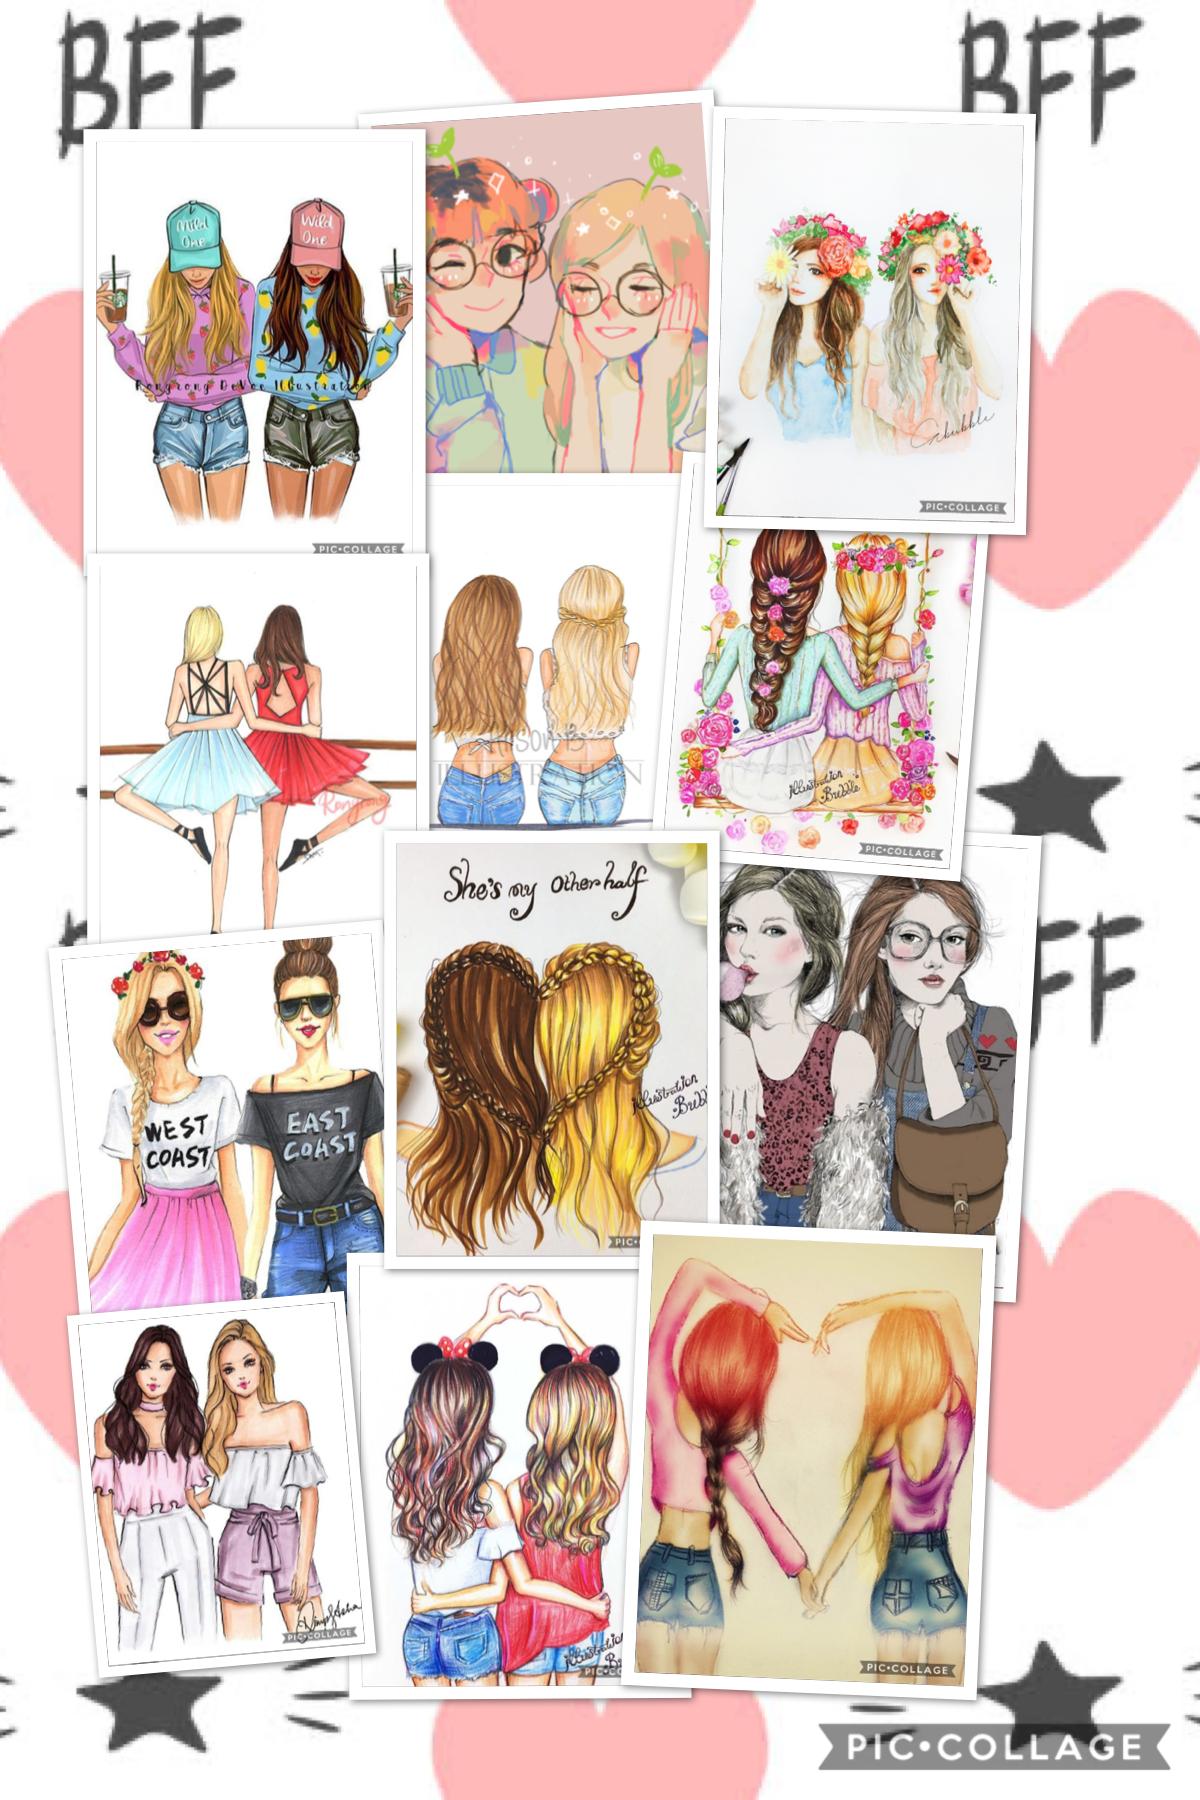 Collage by merrycristmasanna